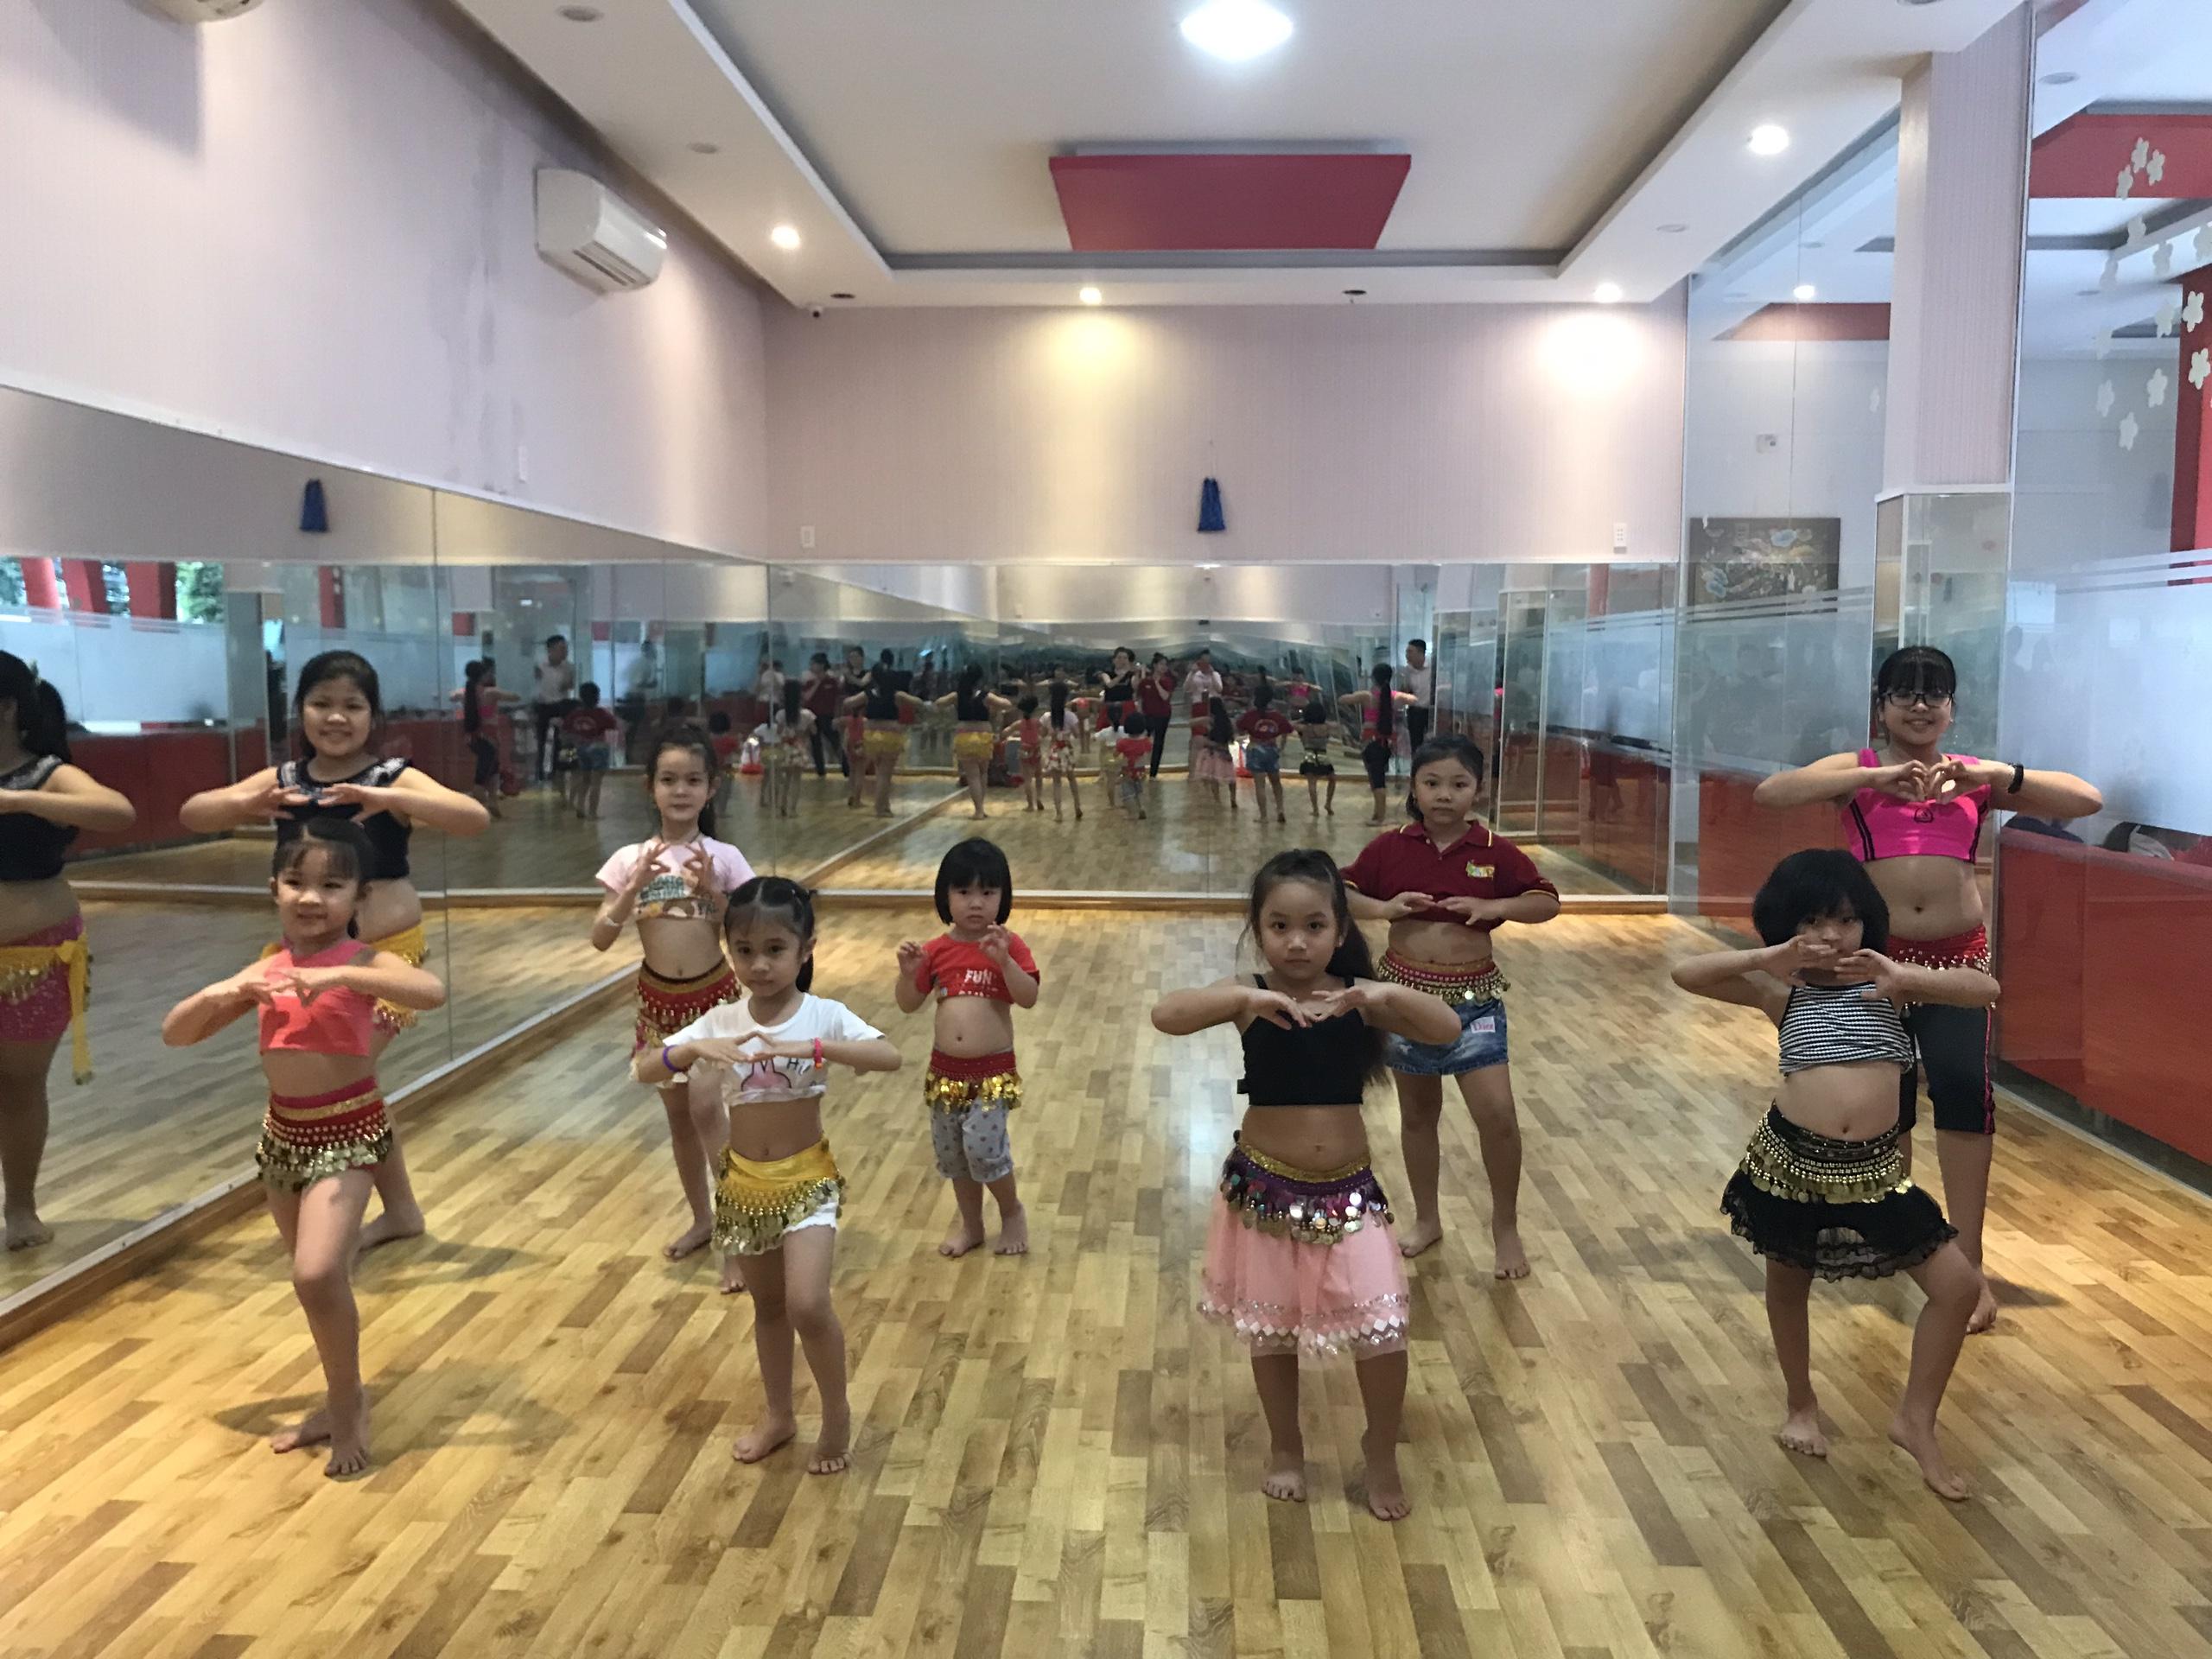 Tuyển sinh lớp Belly Dance - múa bụng thiếu nhi